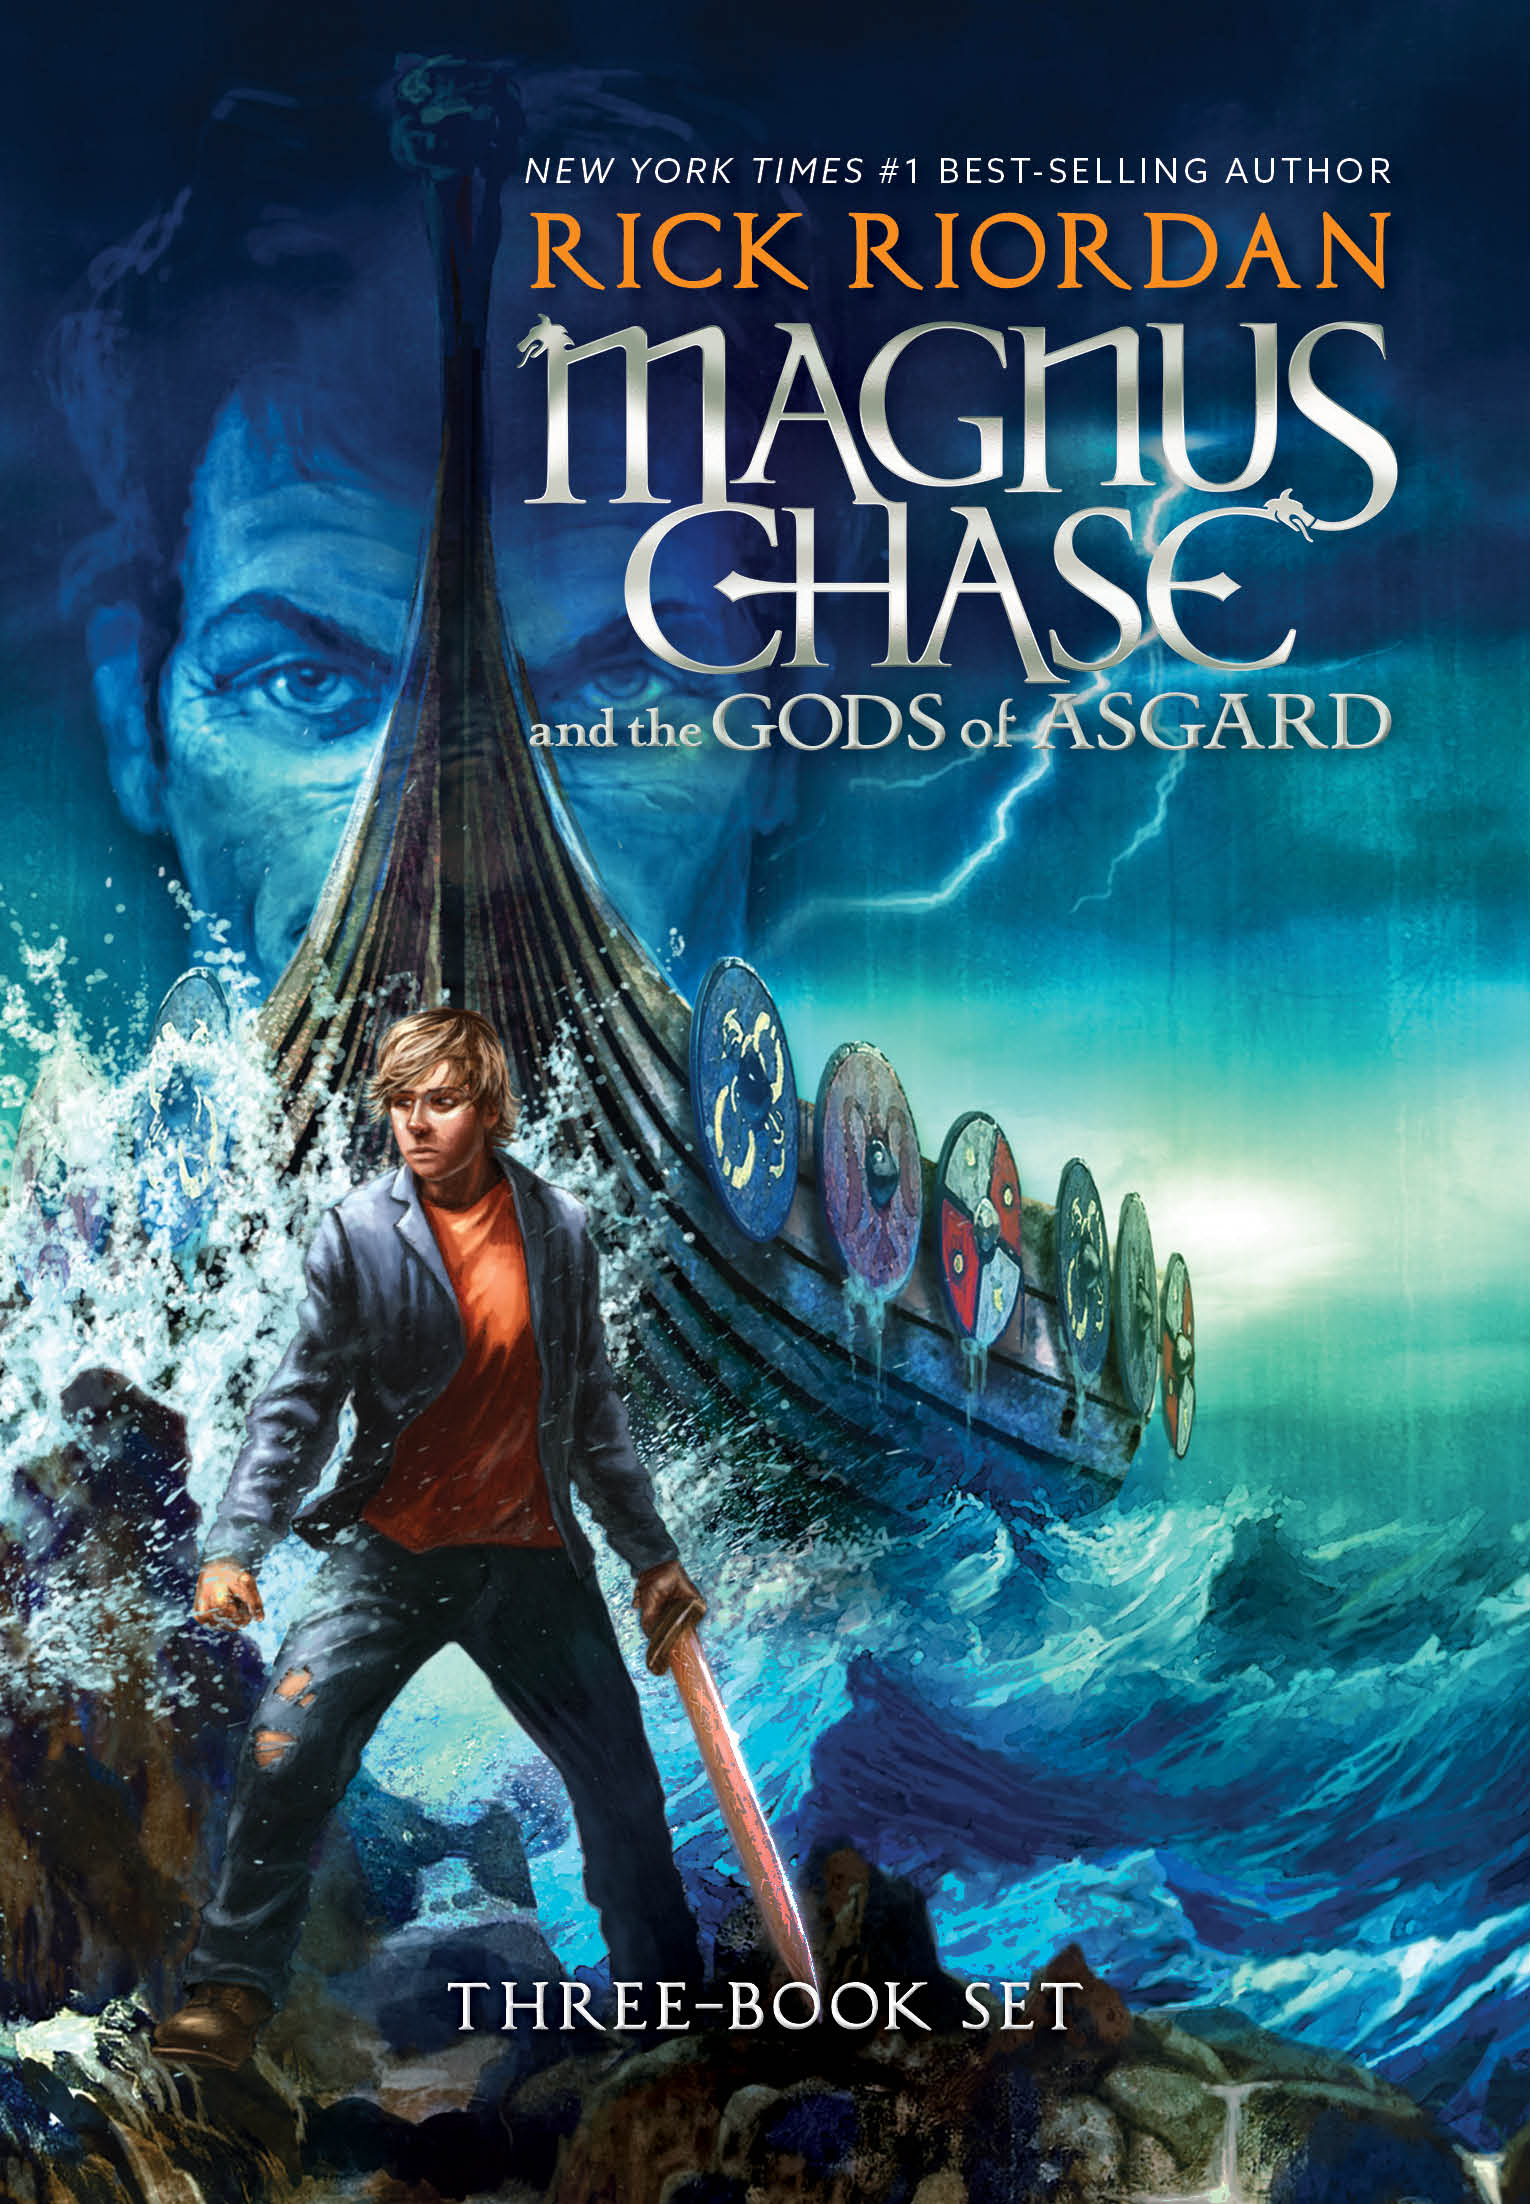 Magnus Chase paperback boxed set